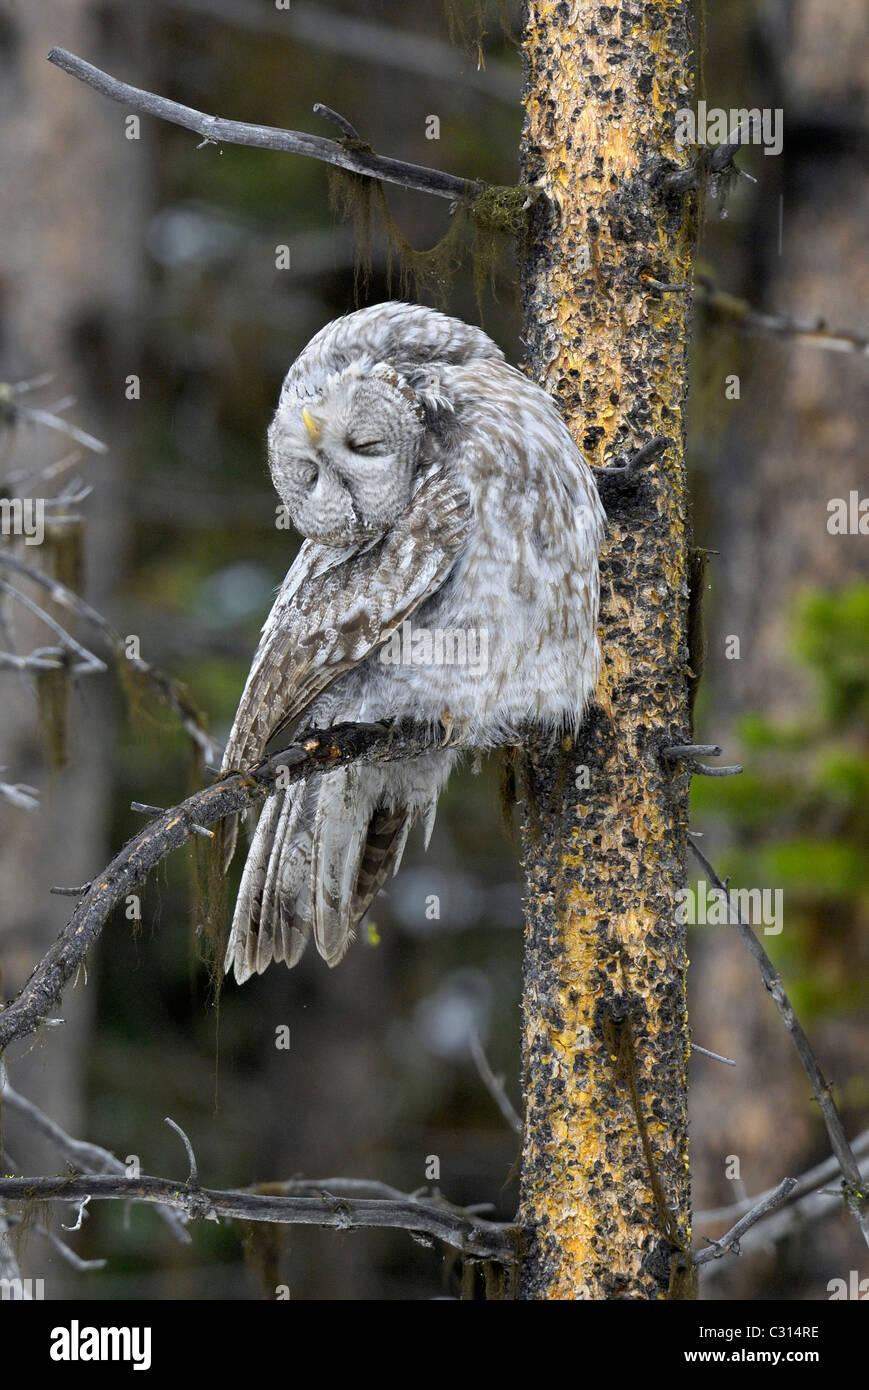 Great Gray Owl Head Upside Down - Stock Image